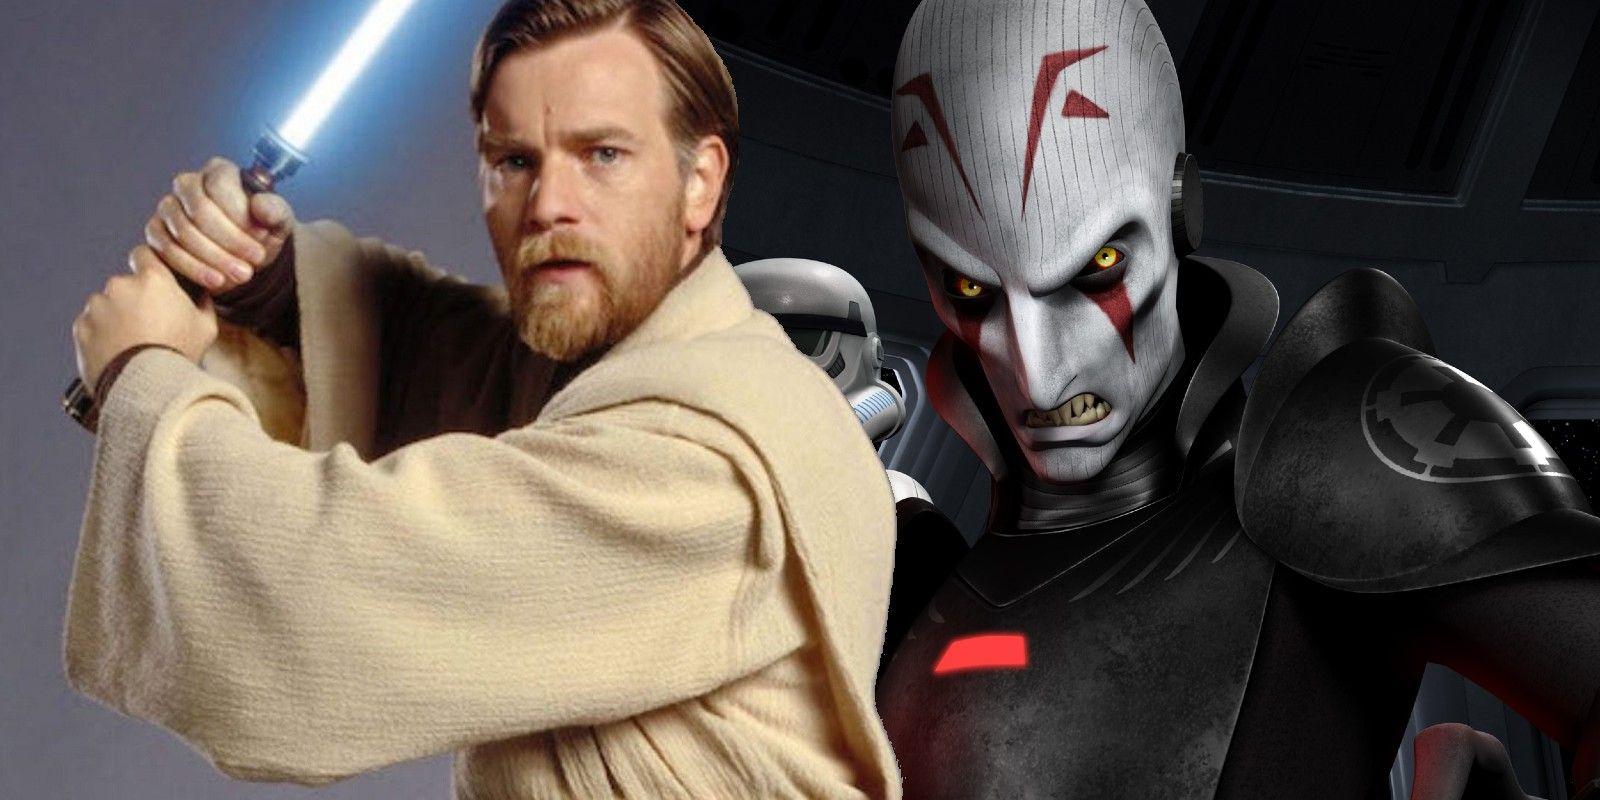 Obi-Wan Kenobi Show May Bring Inquisitors to Live-Action